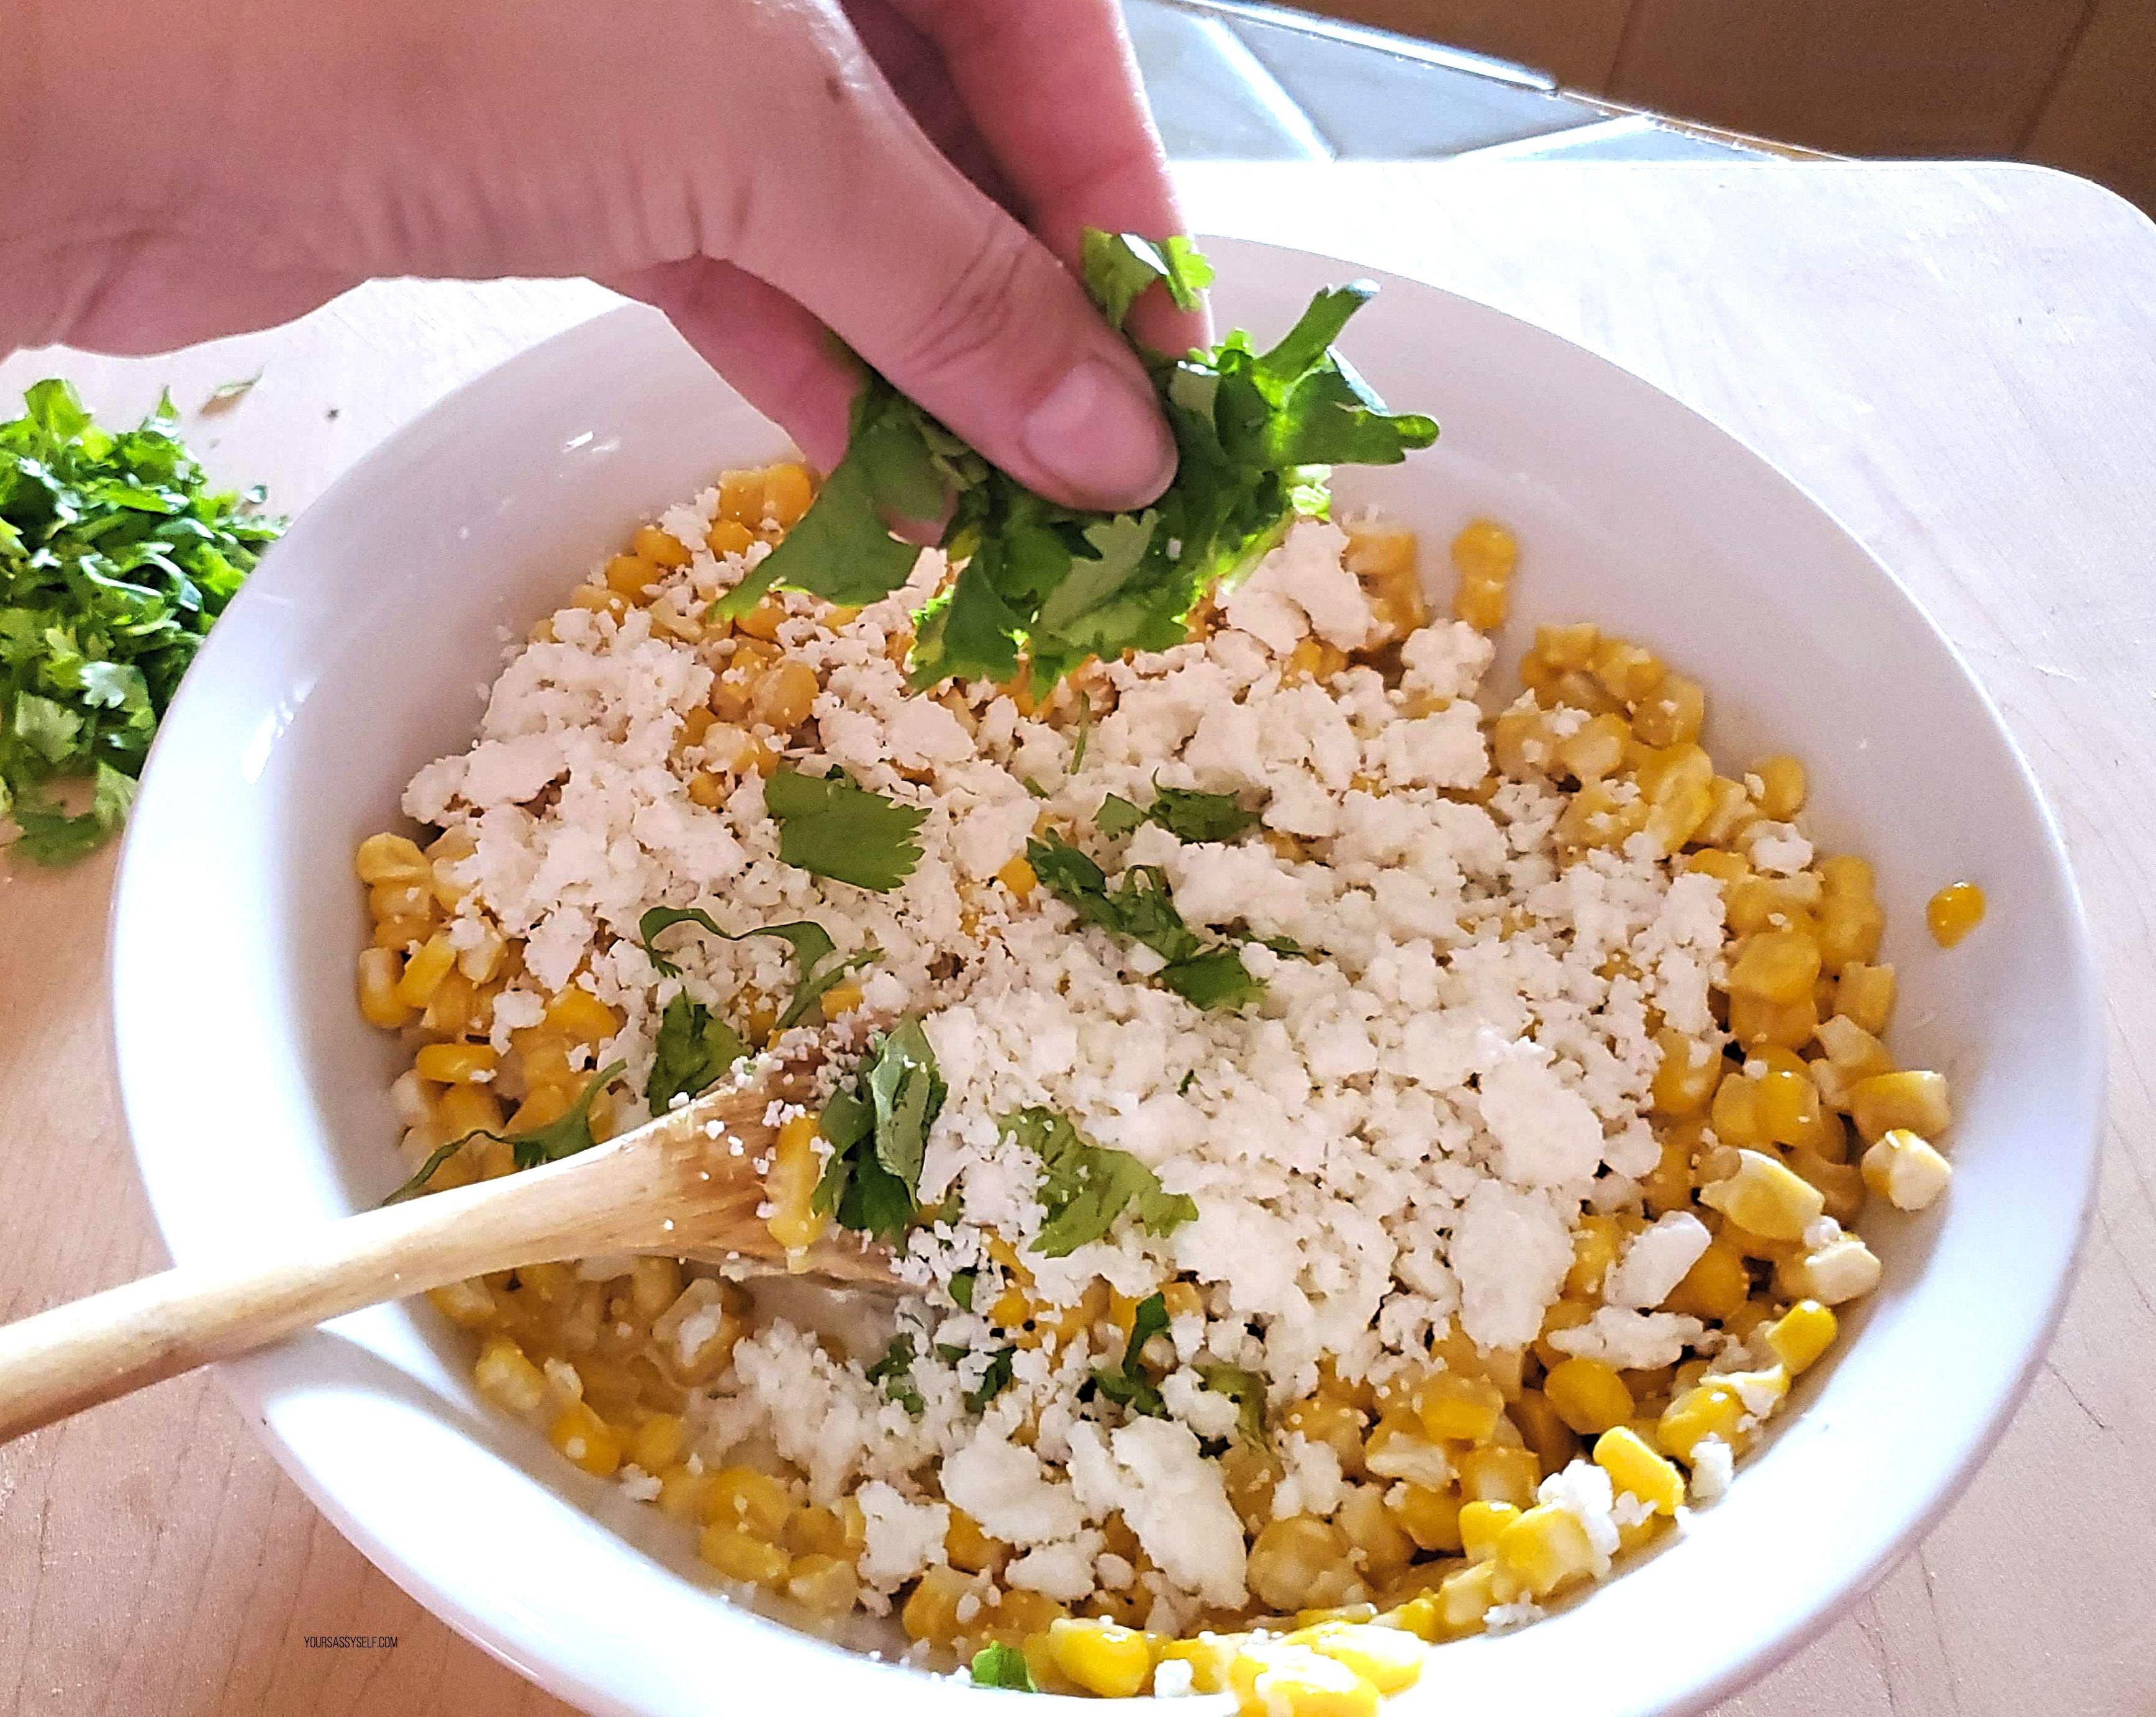 Adding cheese and cilantro to corn mixture - yoursassyself.com